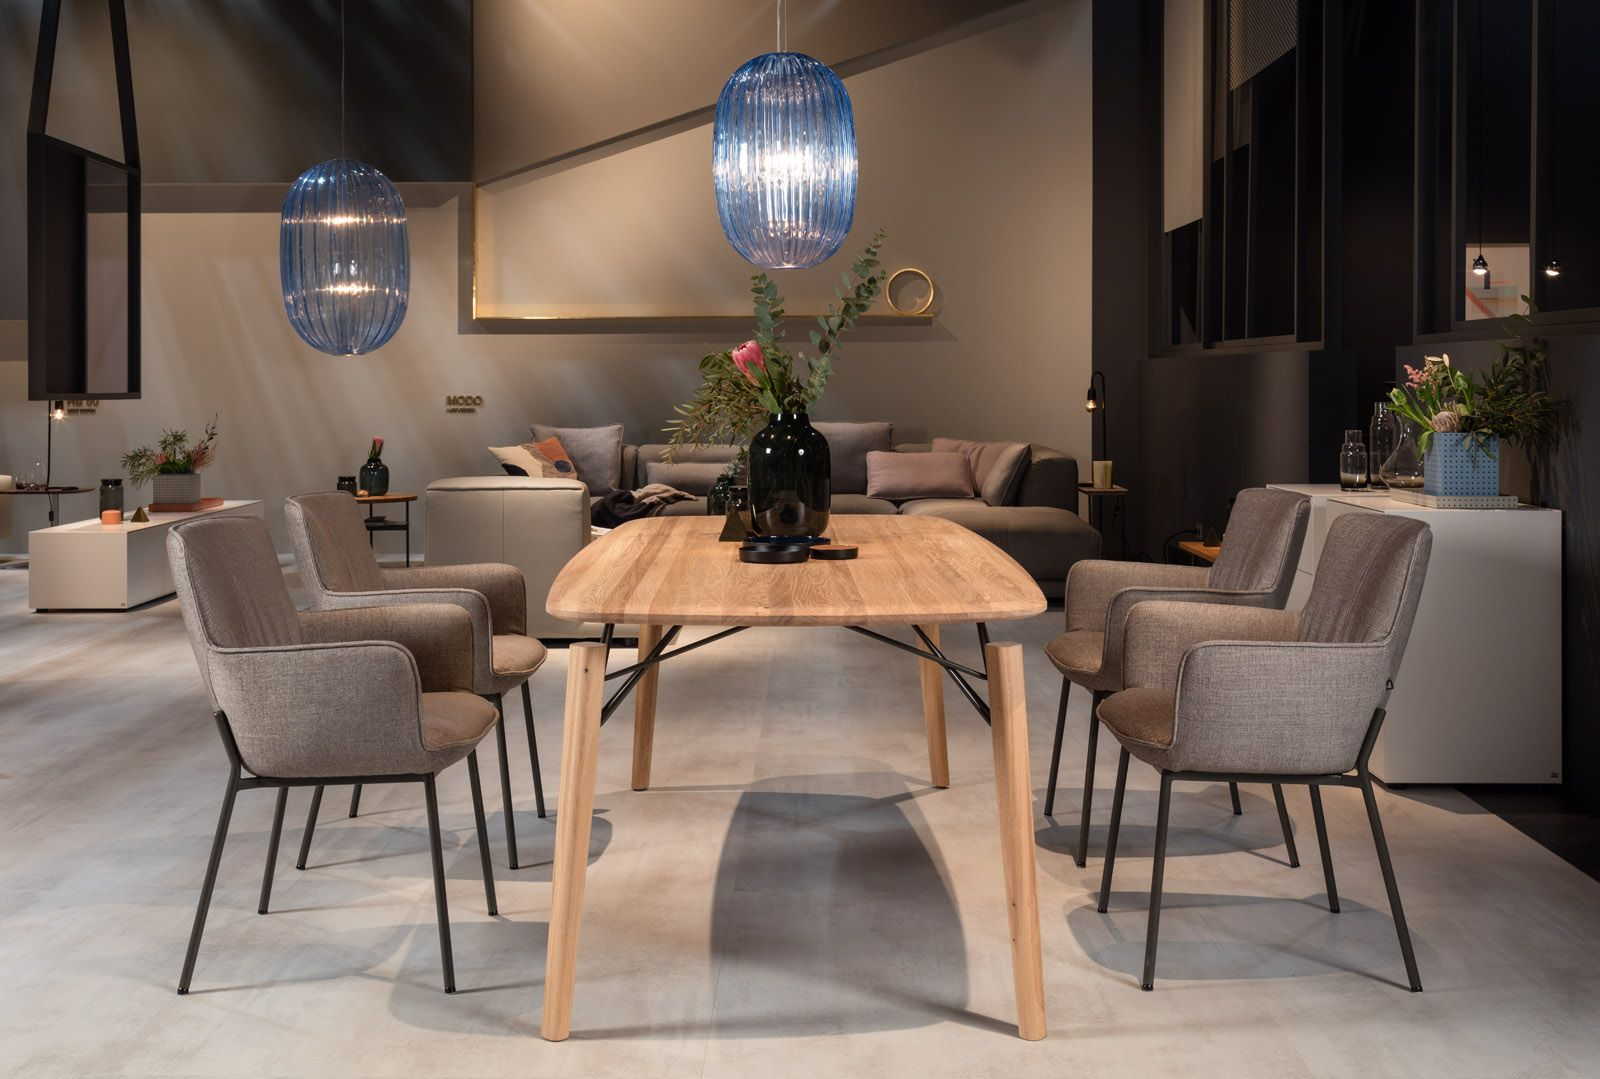 Choose Rolf Benz 964 The Lightness Of Relaxed Hours Table Livingroom Homelover Furniture Design Interior Furniture Luxury Furniture Dining Table